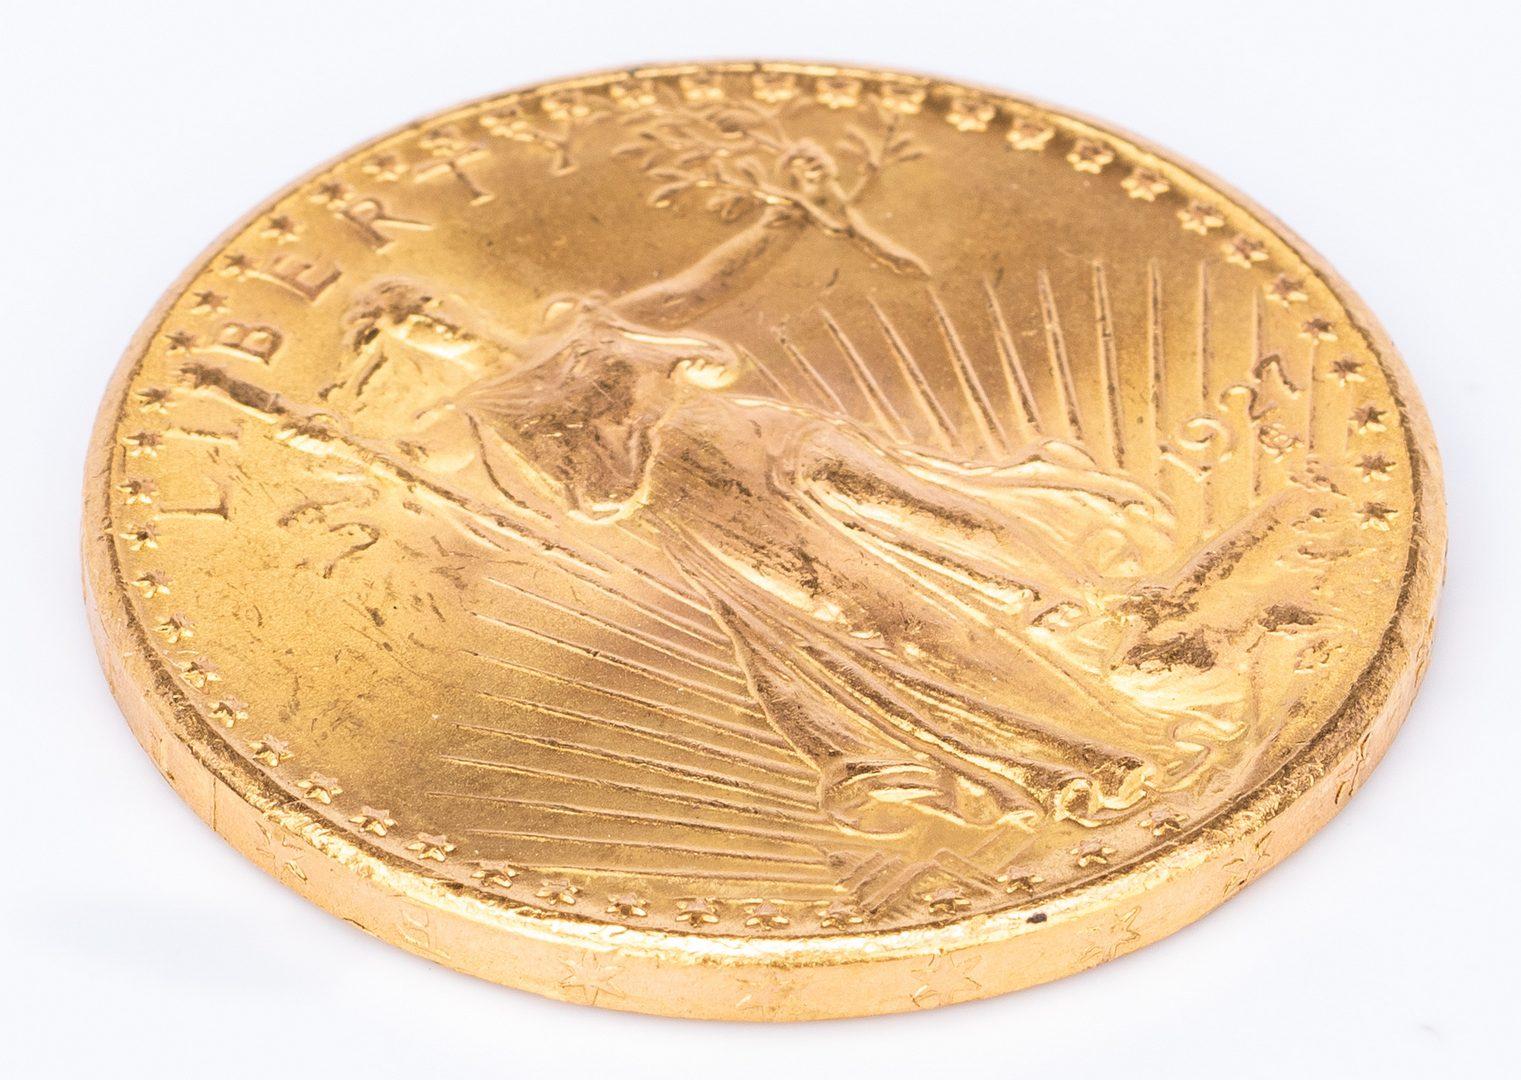 Lot 759: 1927 $20 Saint-Gaudens Gold Coin